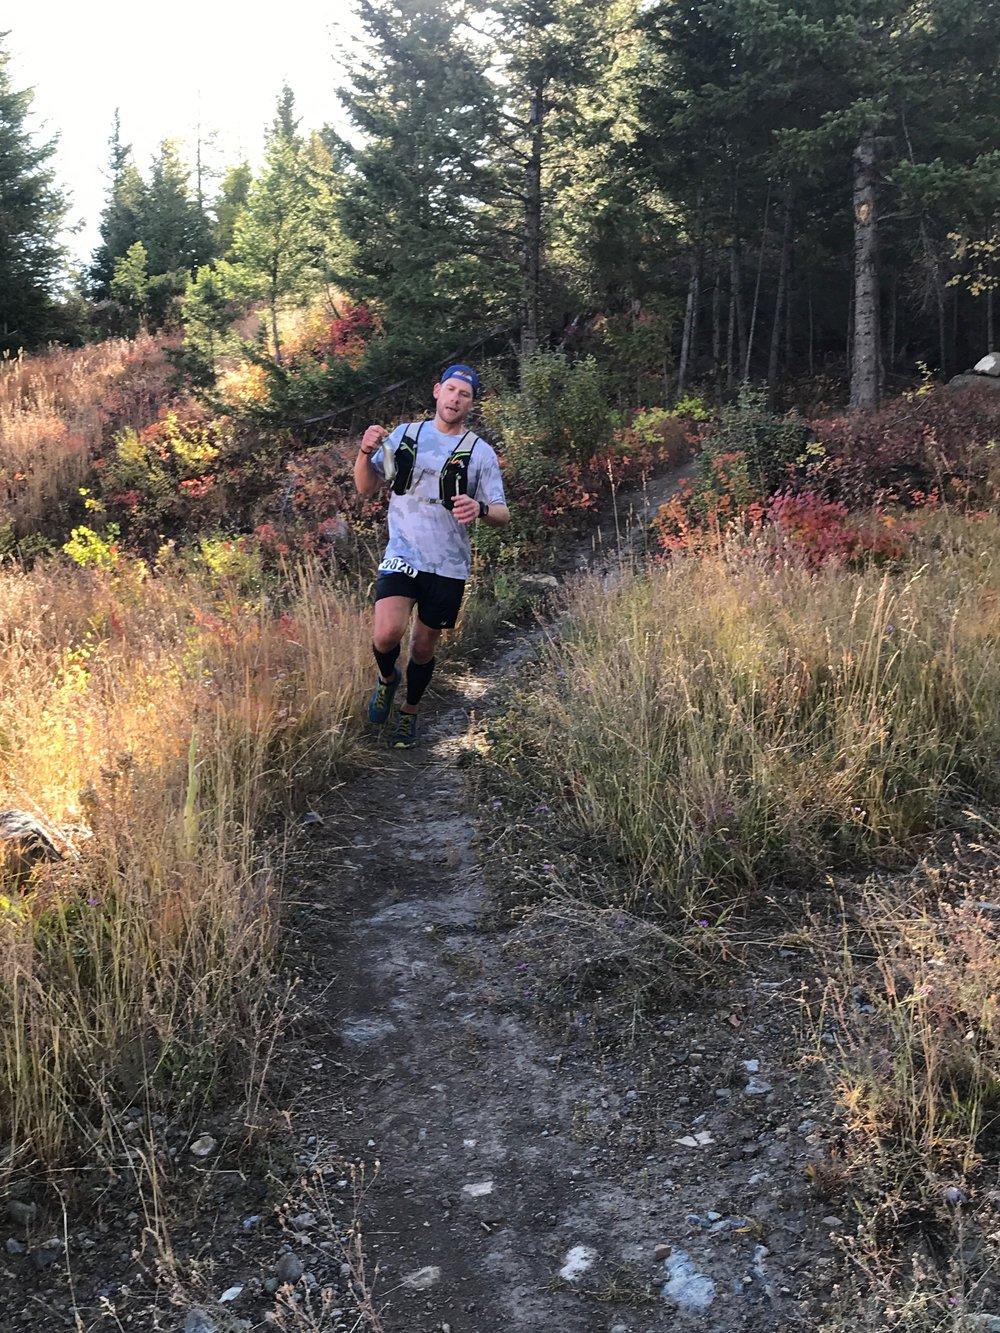 foys to blacktail trails trail marathon ftbtIMG_1745.JPG